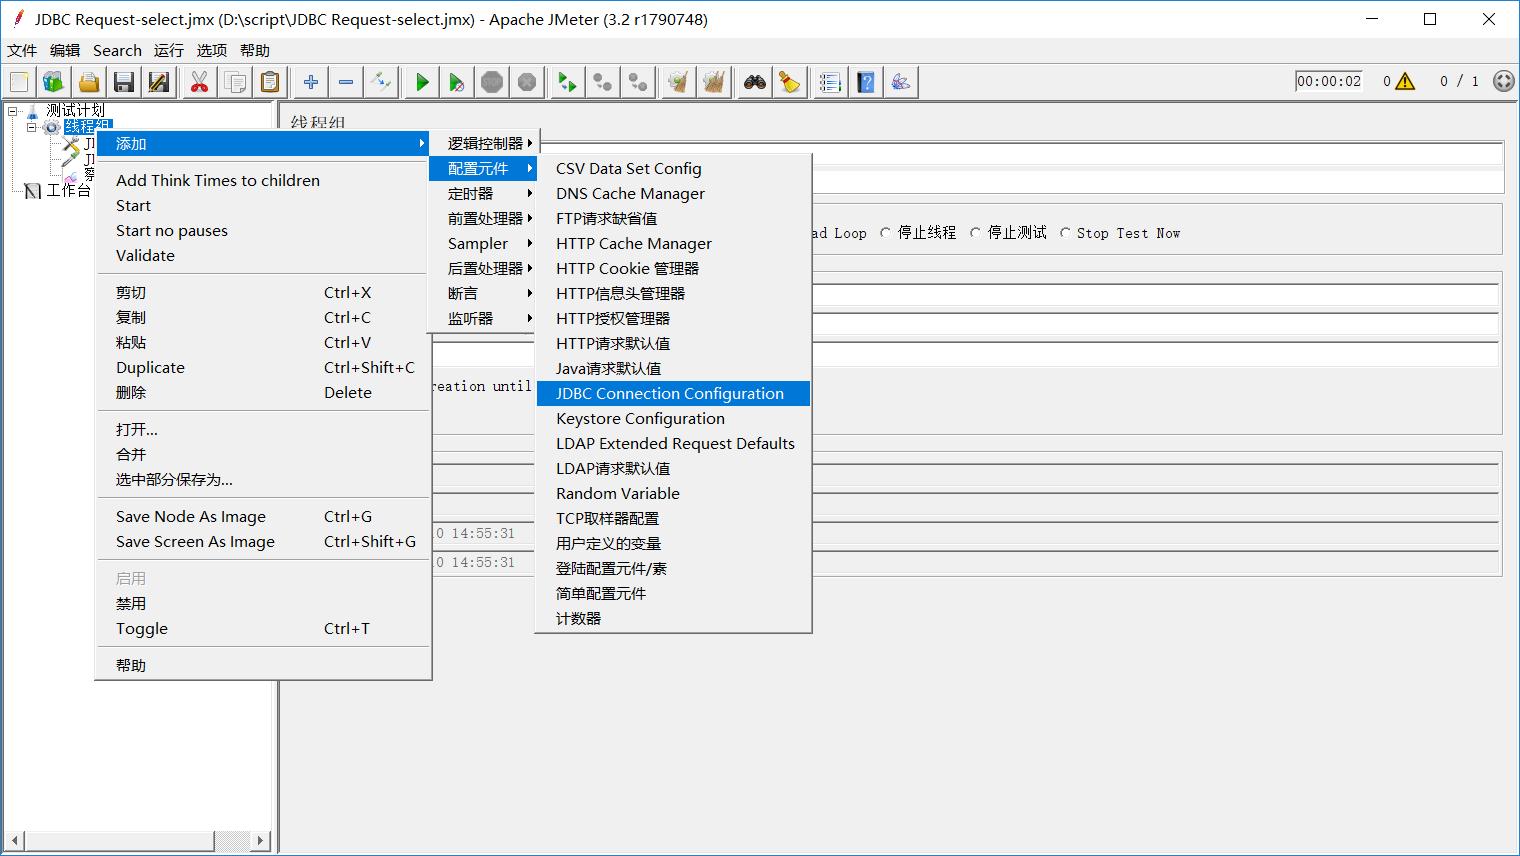 jmeter笔记(9)--JDBC Request的使用